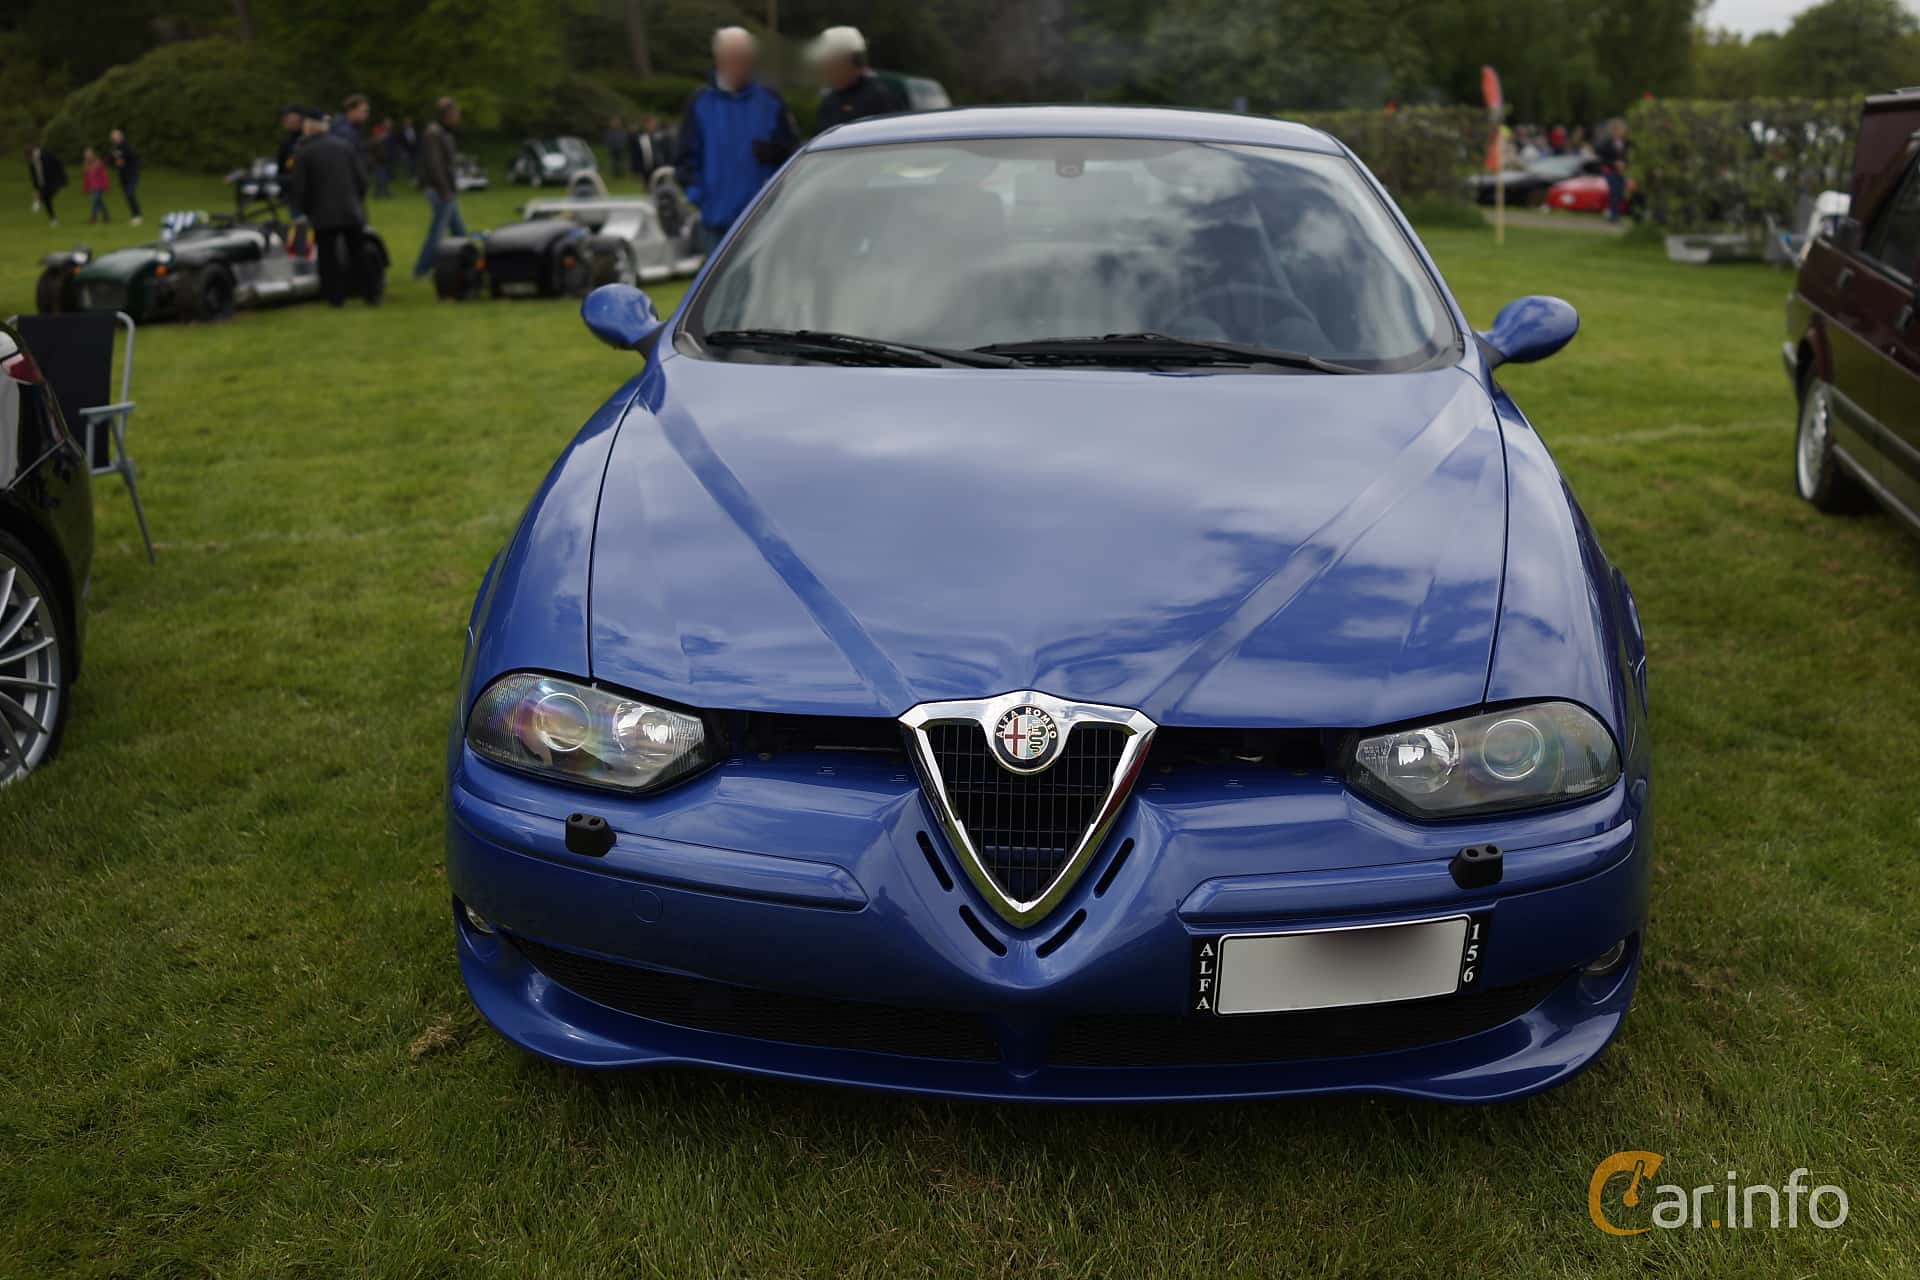 2 images of Alfa Romeo 156 Sportswagon GTA 3 2 V6 Manual 250hp